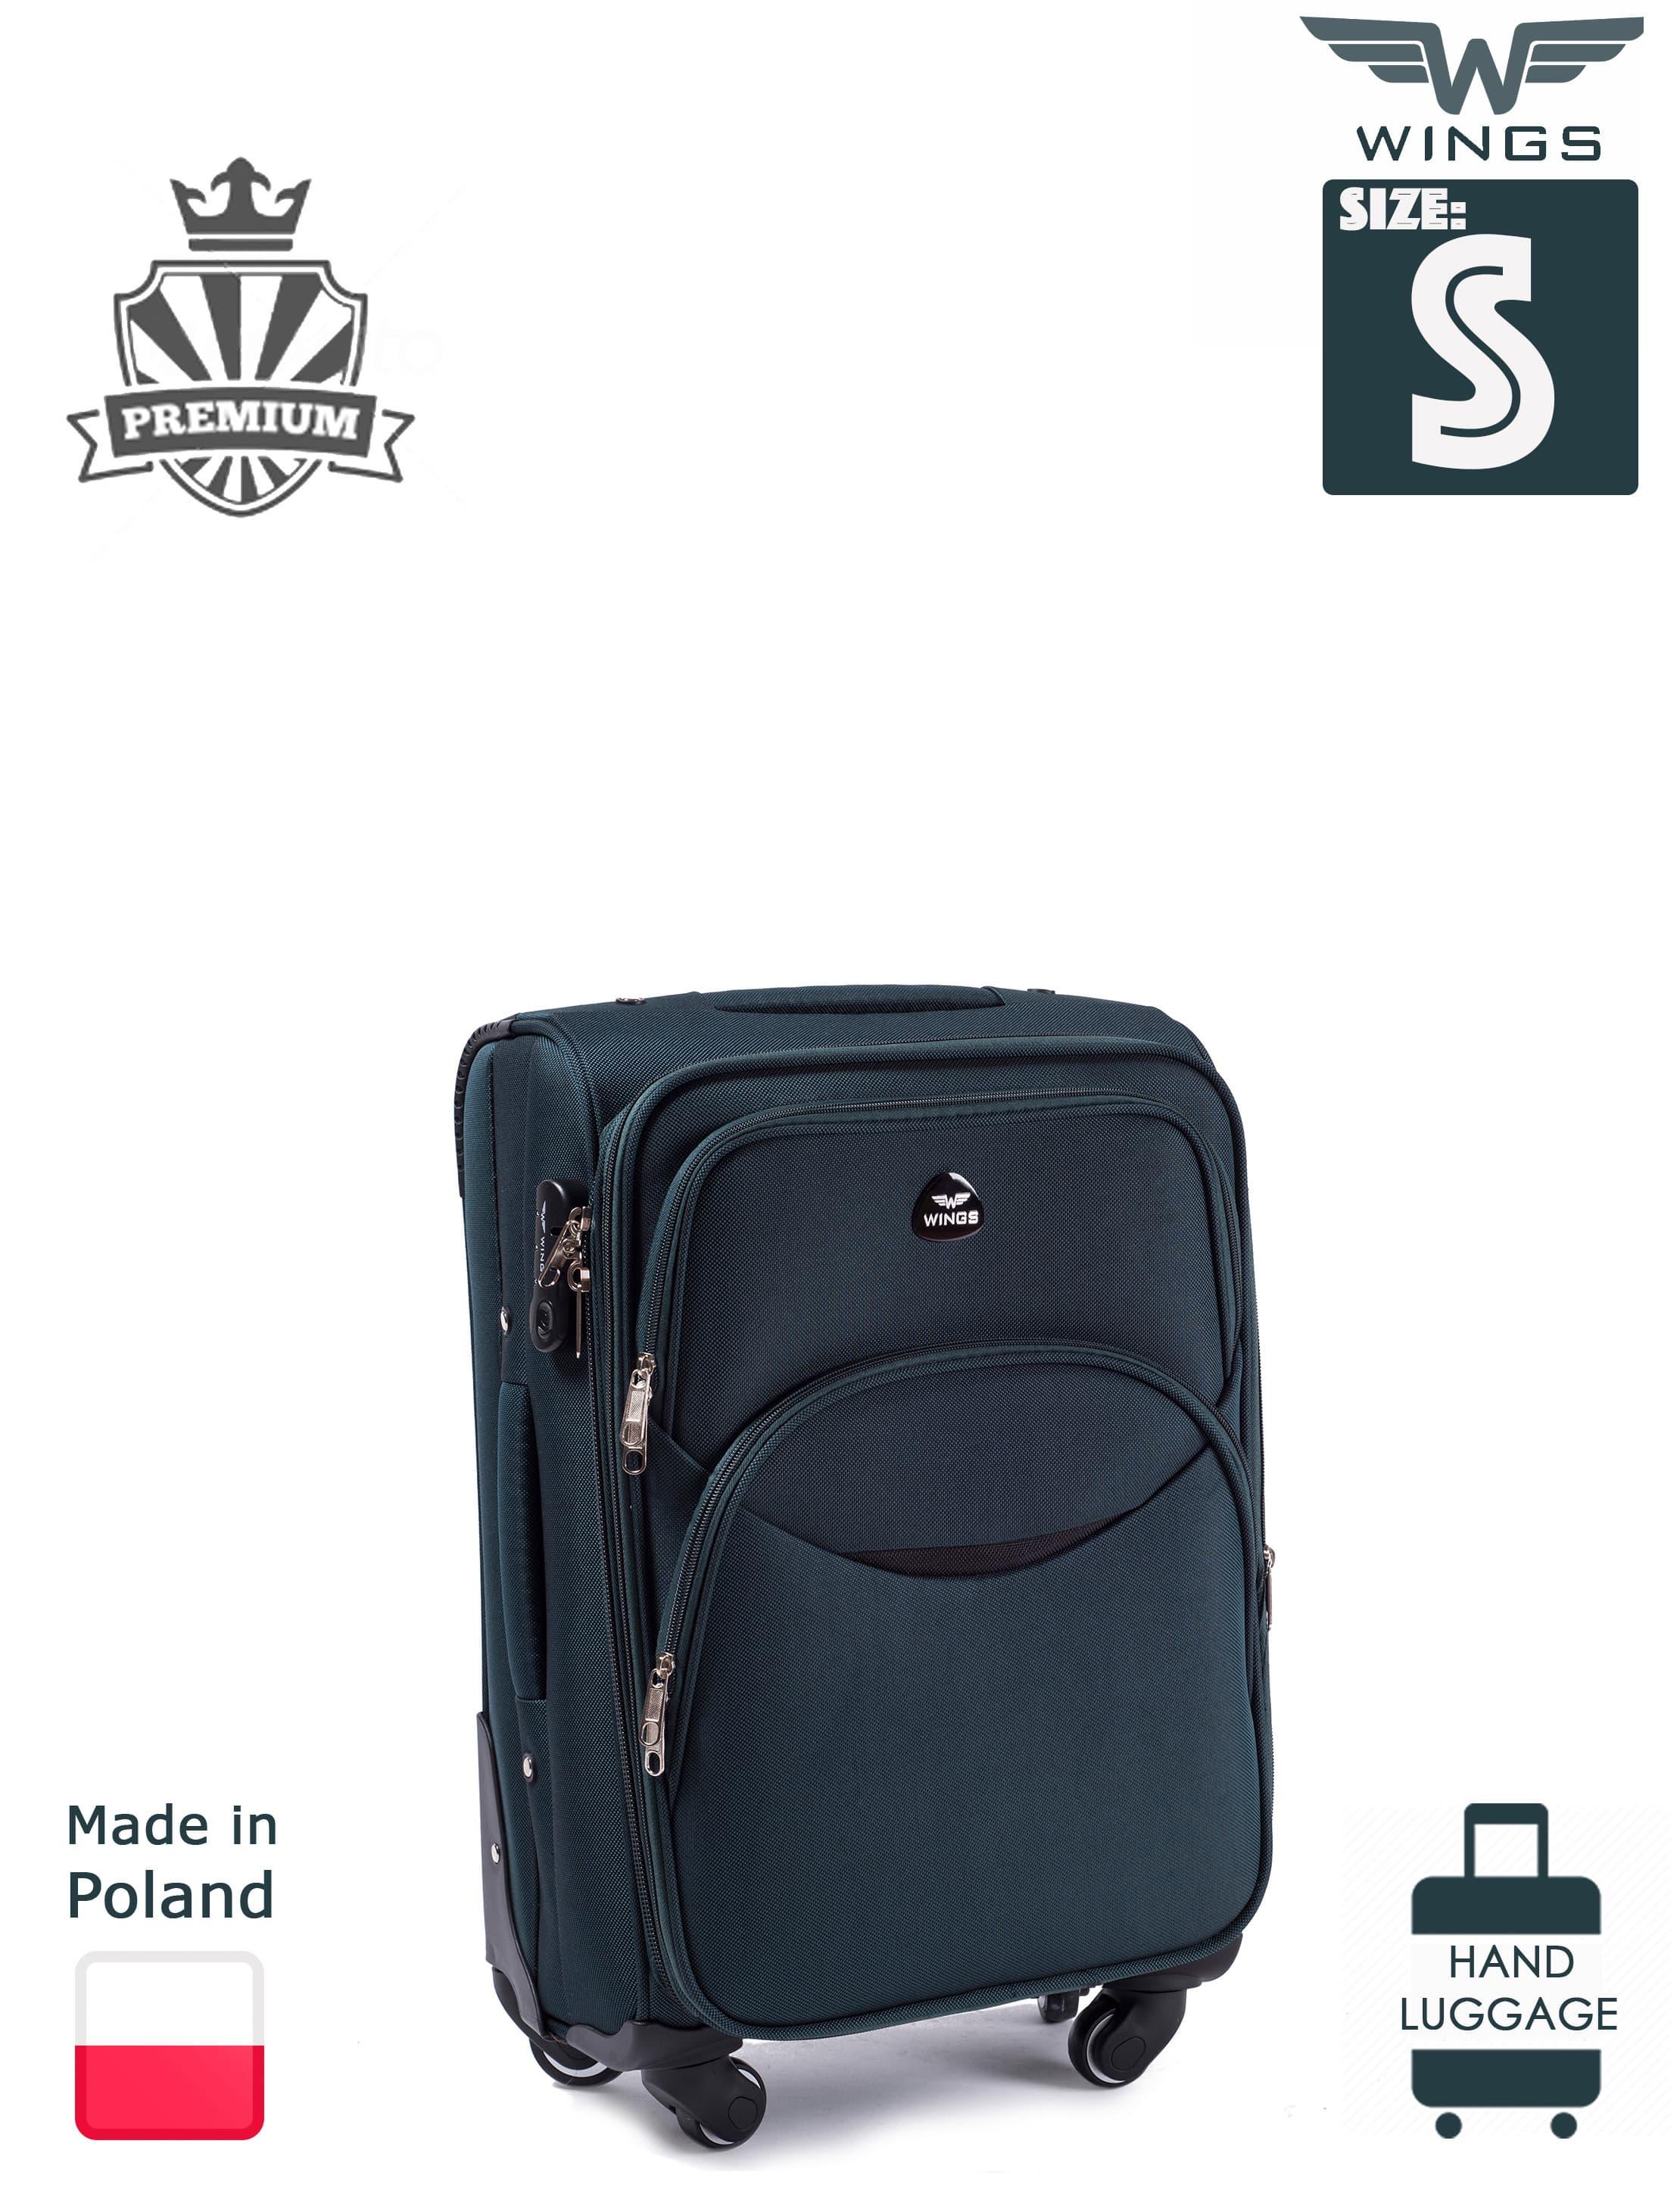 Valiza mica din textil Wings 1706-4 S Green PREMIUM pe 4 roti rezistente!Pt bagaj,pina la 10 kg